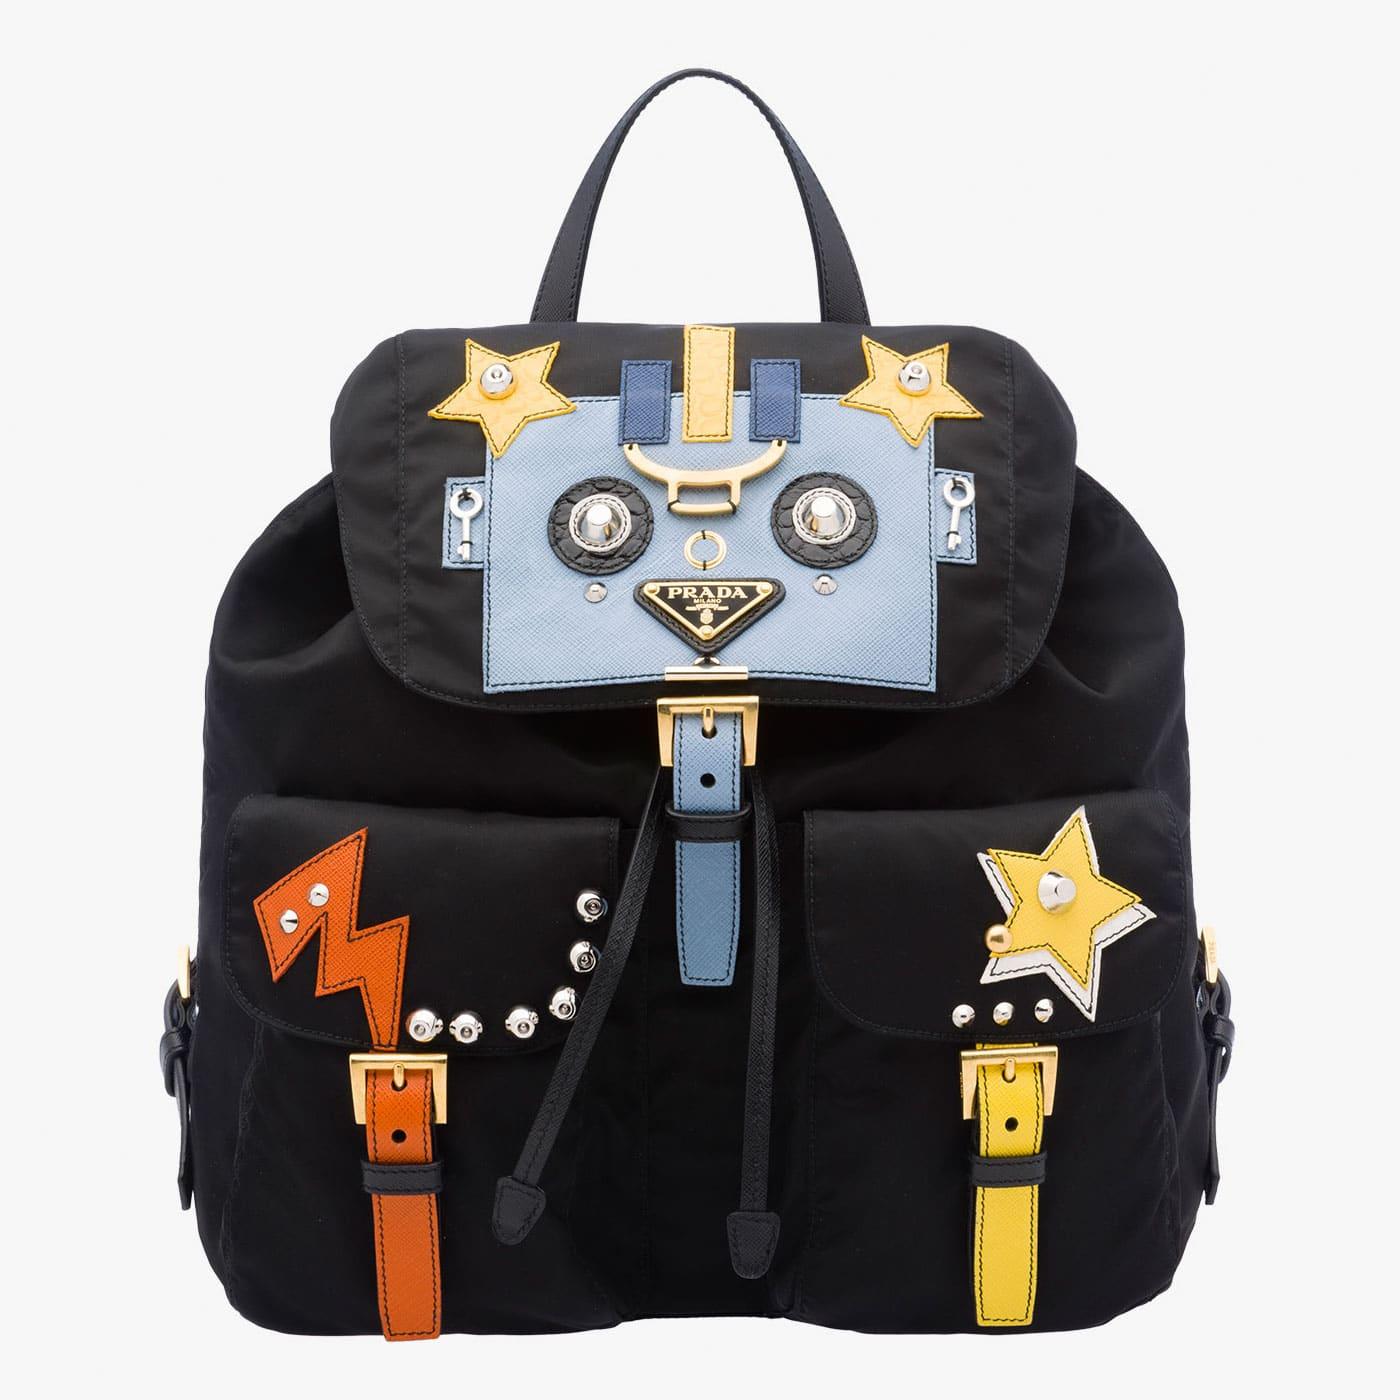 1ce6e03f089b Prada Black Pale Blue Robot Backpack Bag